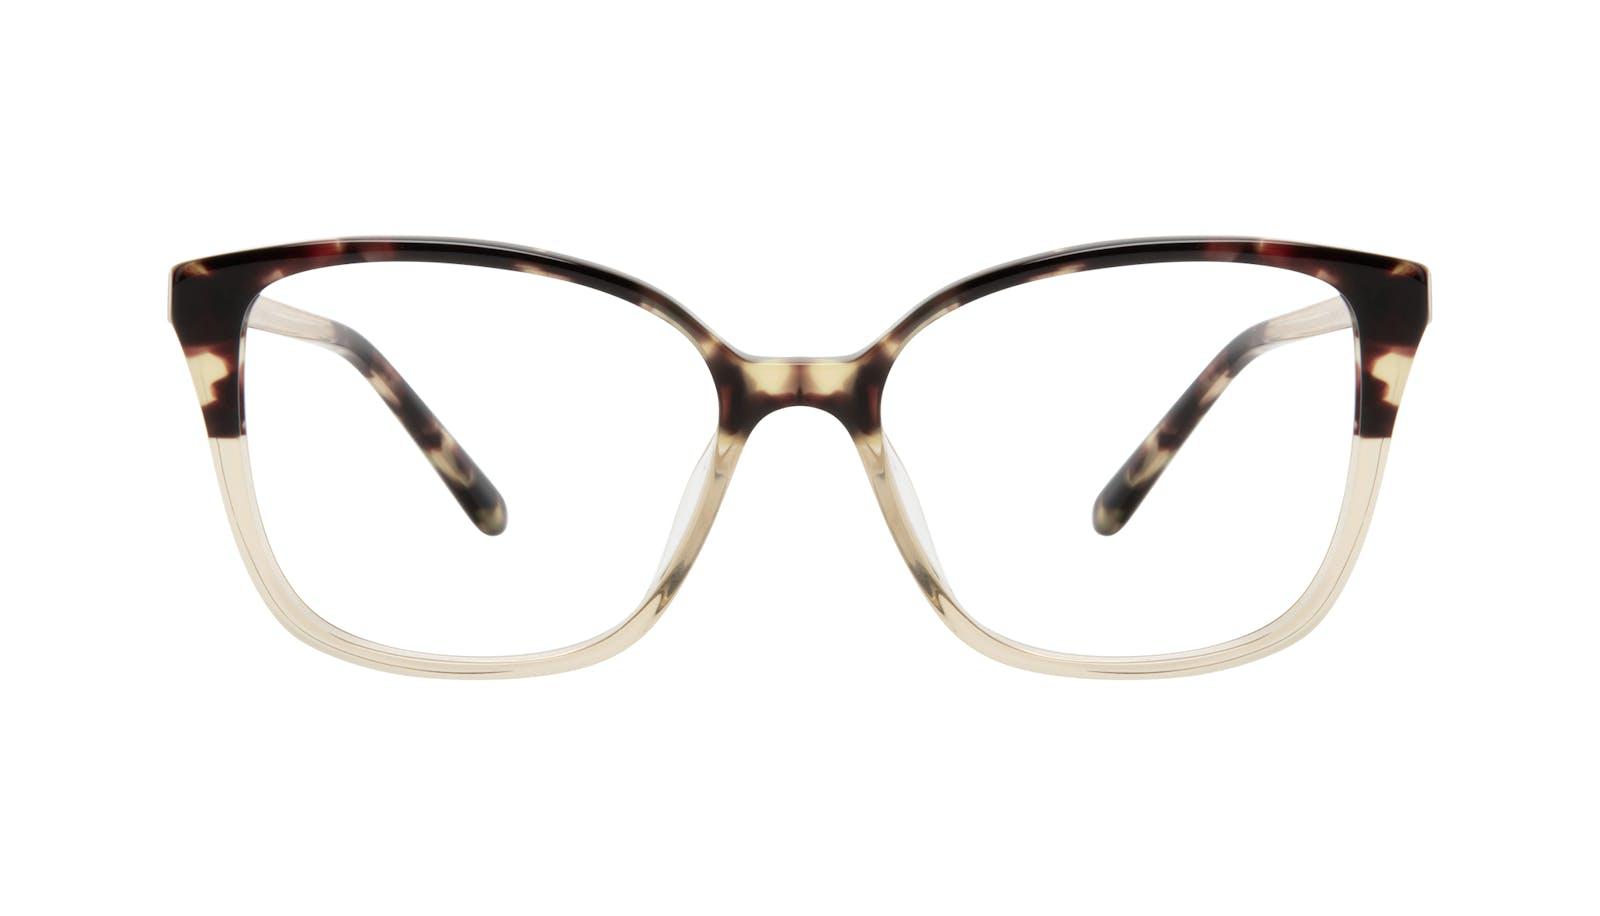 2be0cb7bf84 Affordable Fashion Glasses Square Eyeglasses Women Only Golden Tort